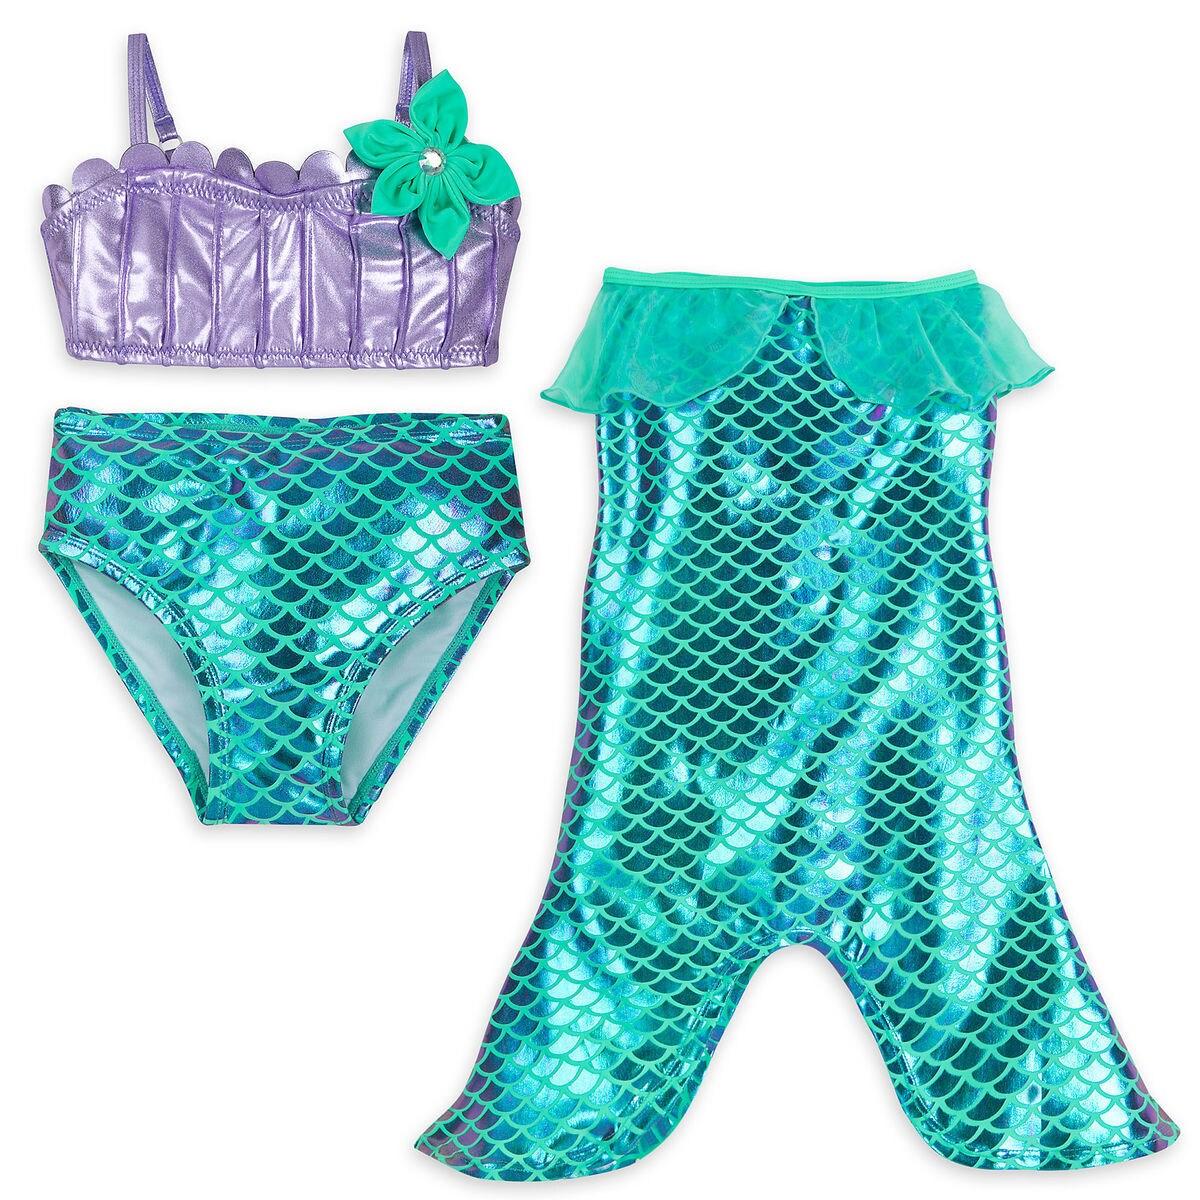 fffd3849f6 Product Image of Ariel Swimwear Set for Girls   1